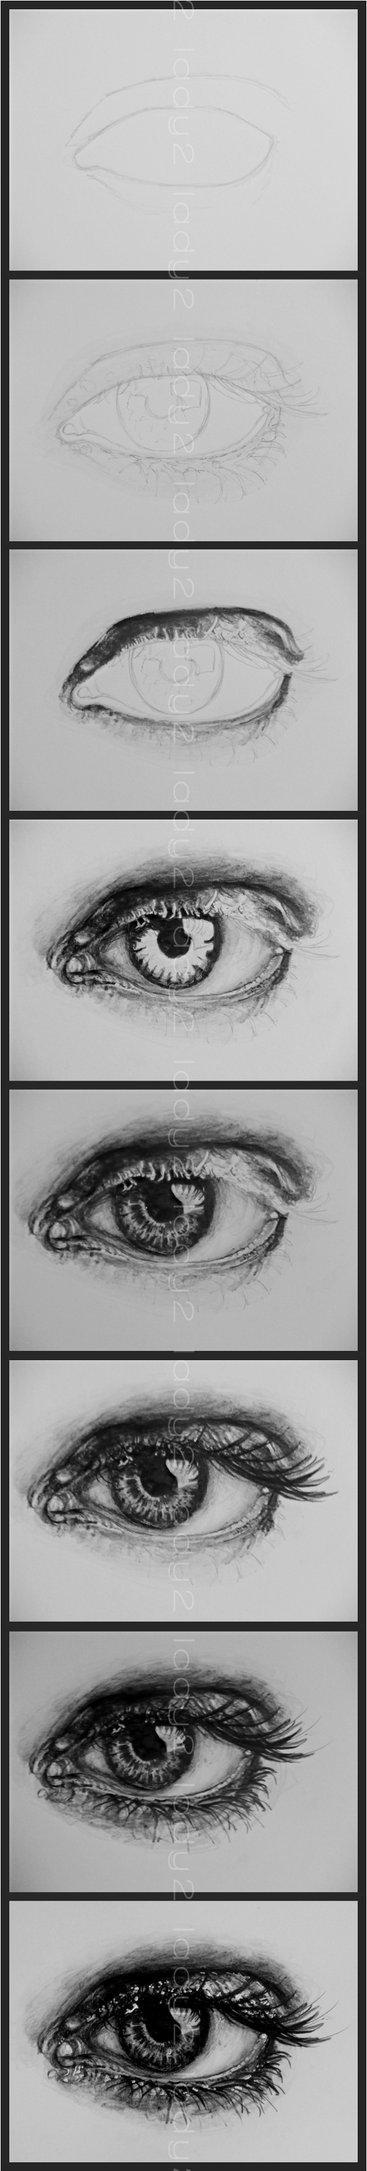 jak-narysowac-oko.jpg